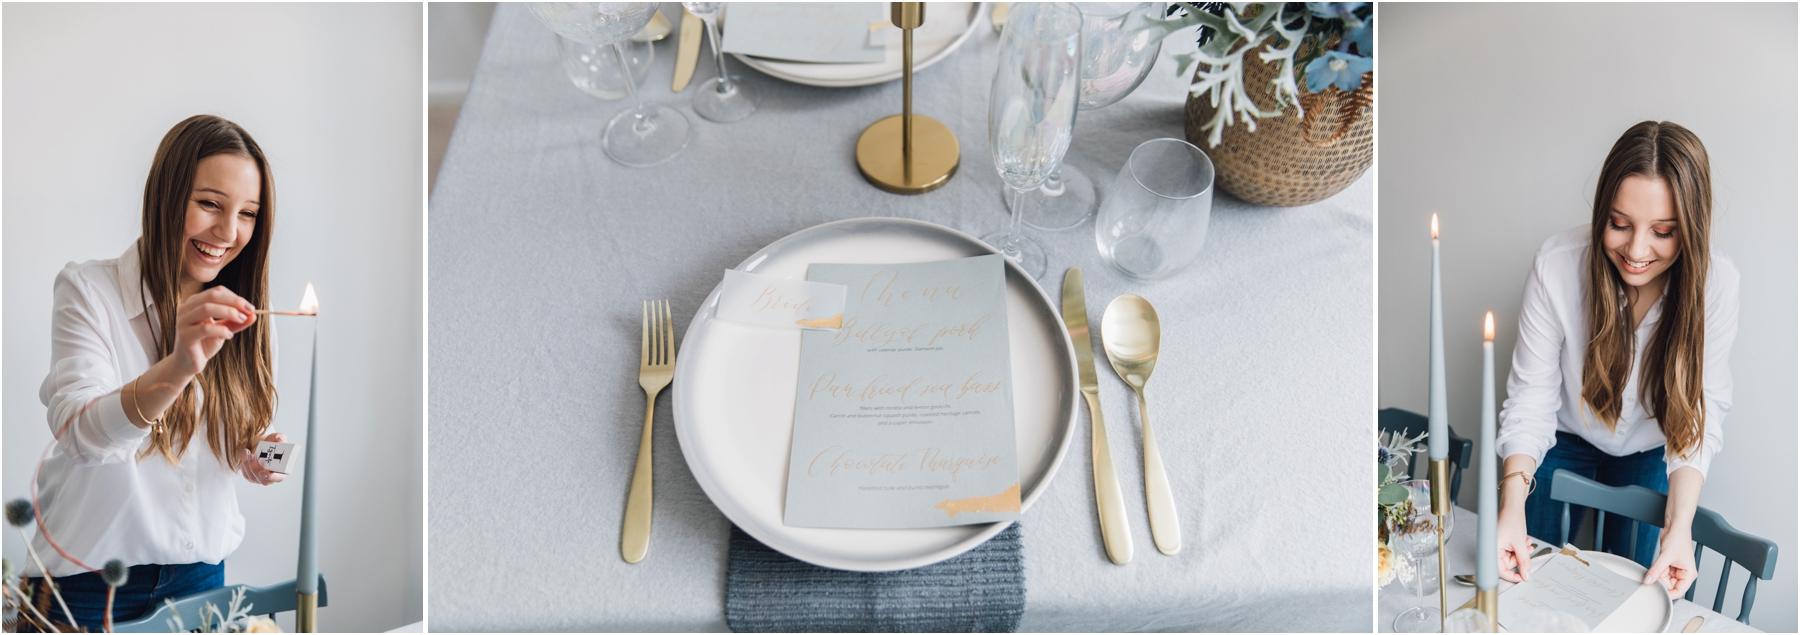 Rachel Dalton Wedding Planner Branding Photography